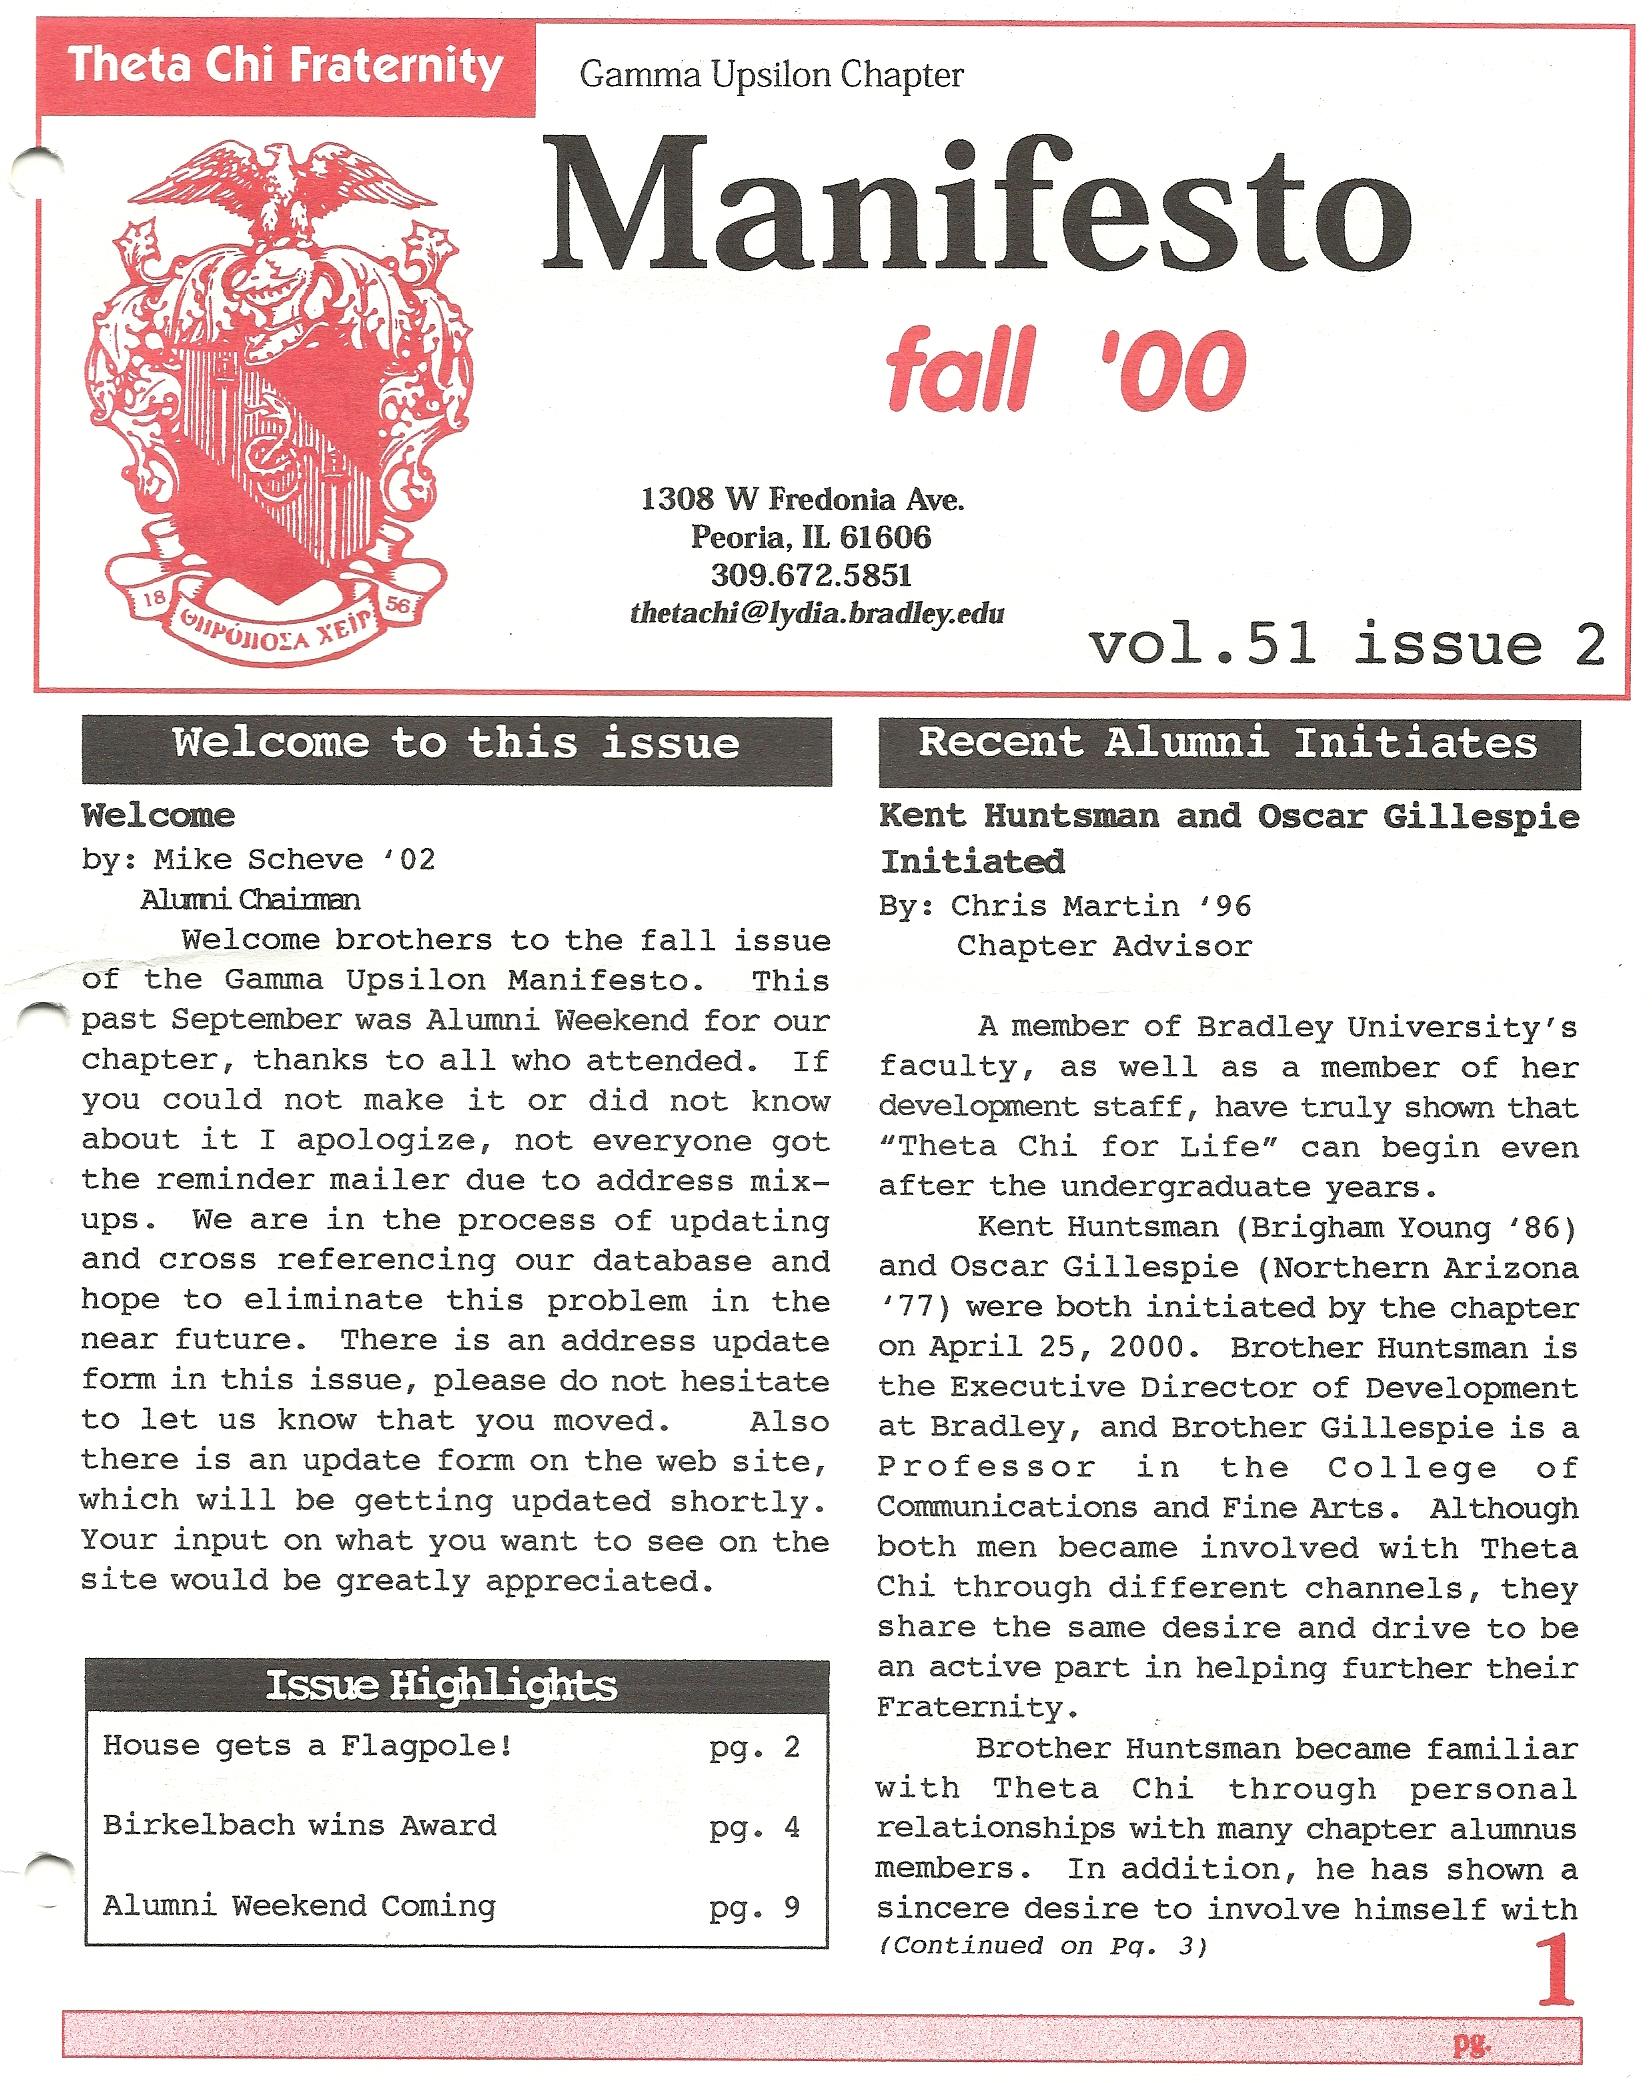 manifesto_fall_20000001